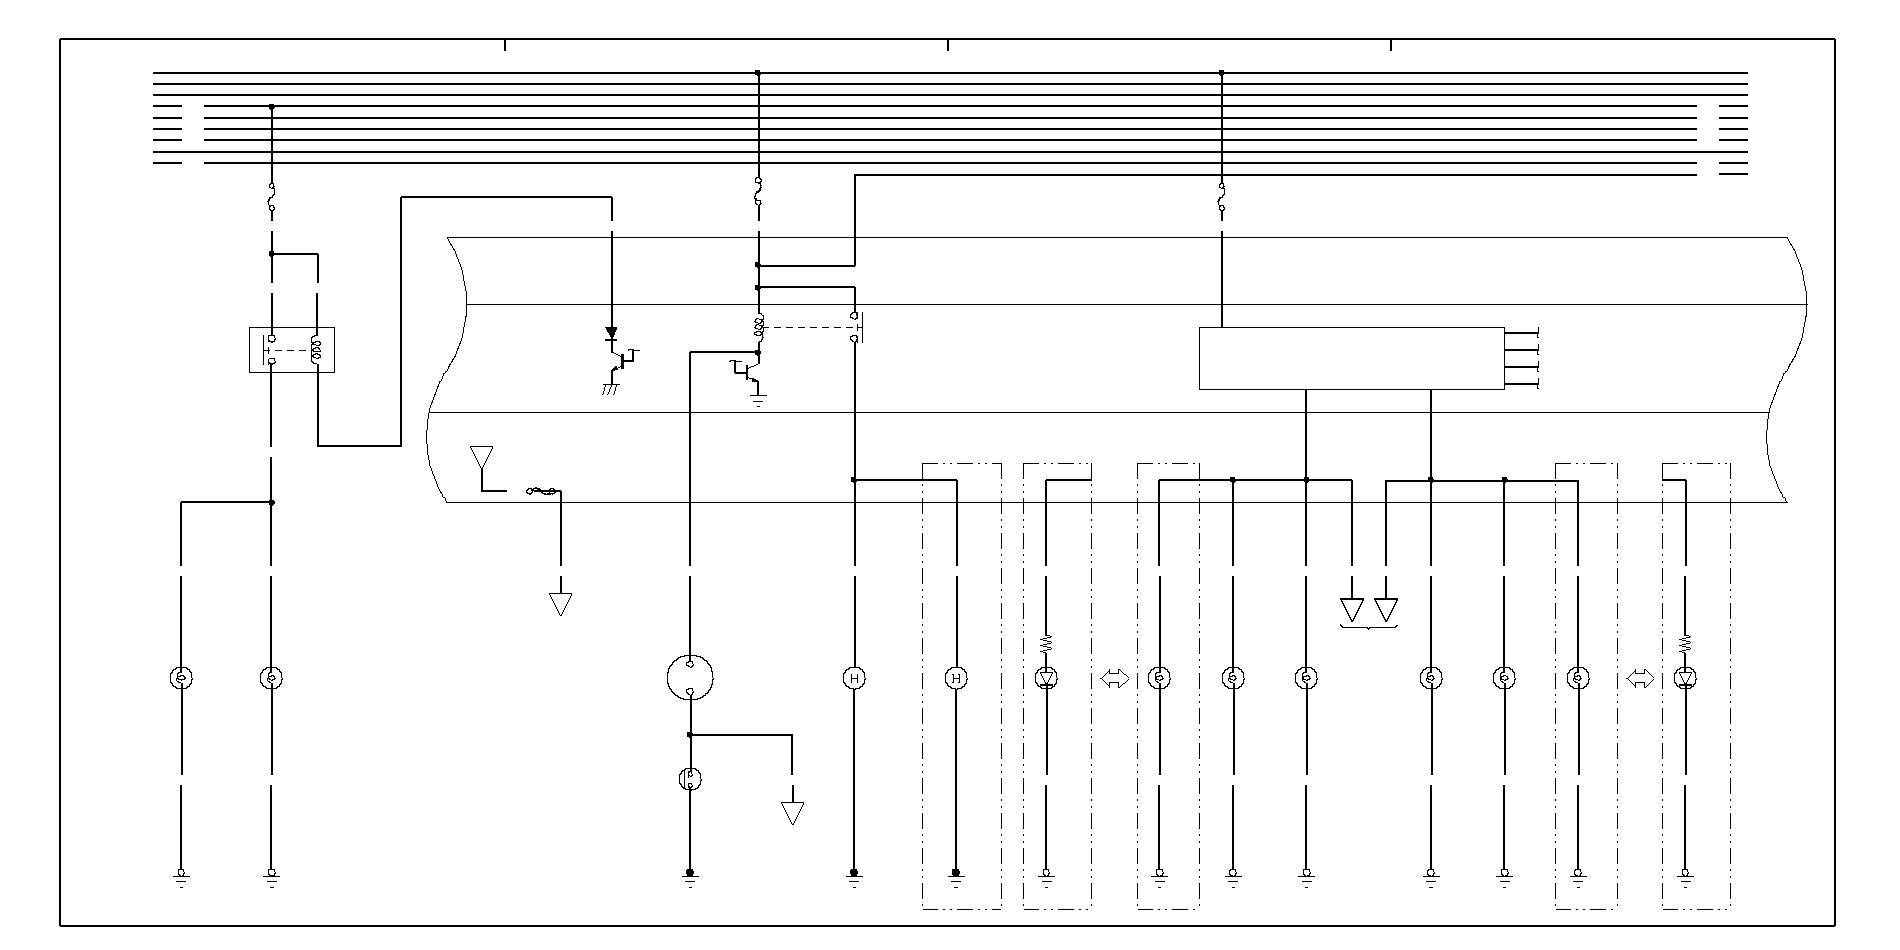 Radio Wiring Diagram Honda Car Radio Stereo Audio Wiring Diagram